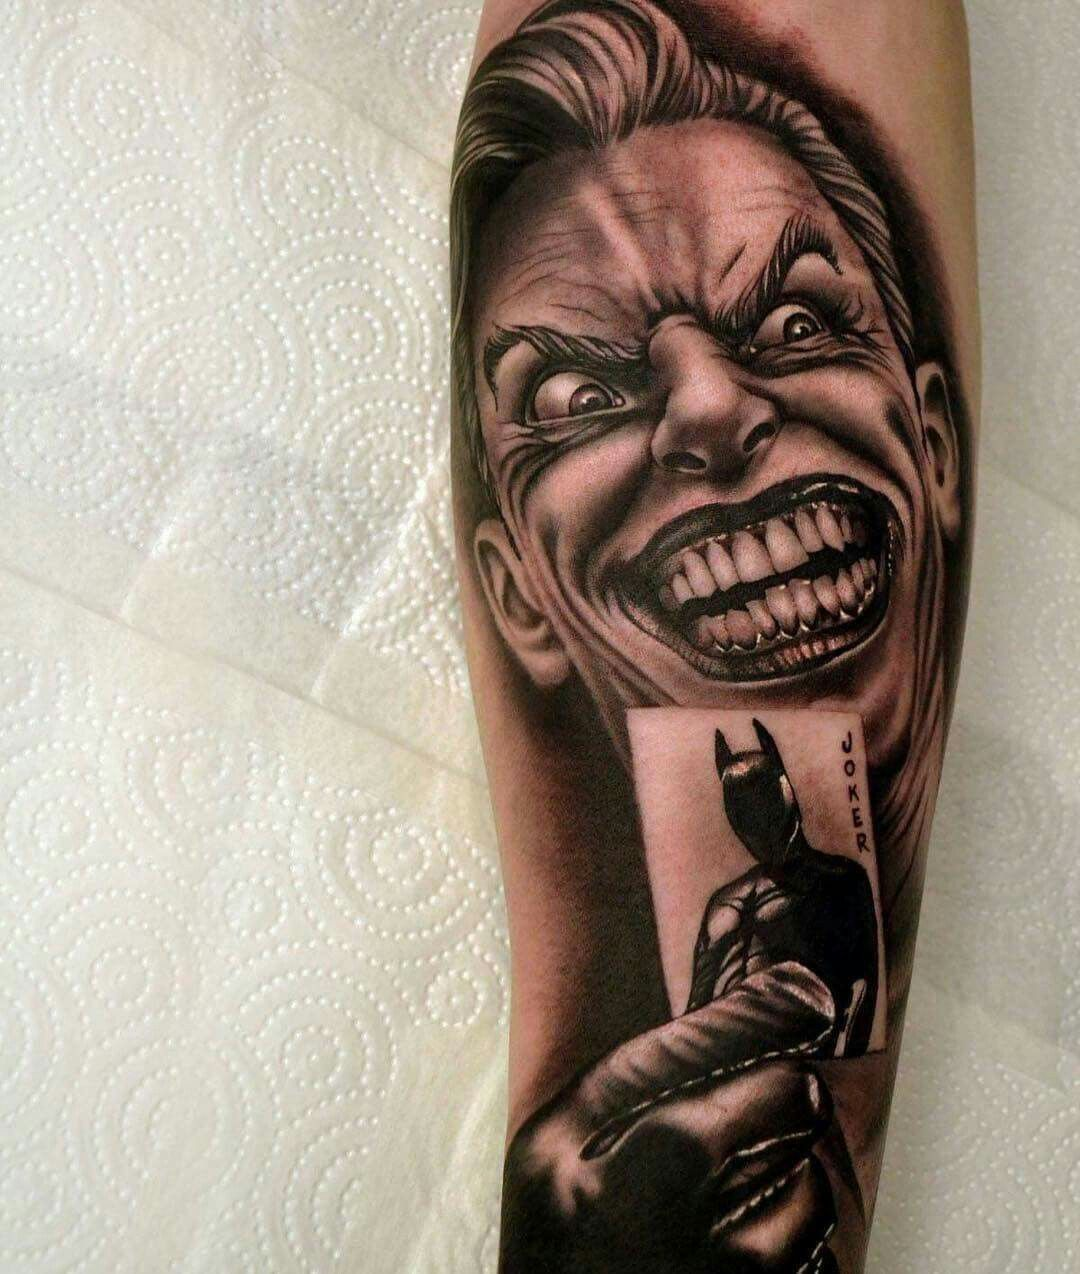 joker tattoo tatoo stuff t towierungen tattoo ideen y. Black Bedroom Furniture Sets. Home Design Ideas